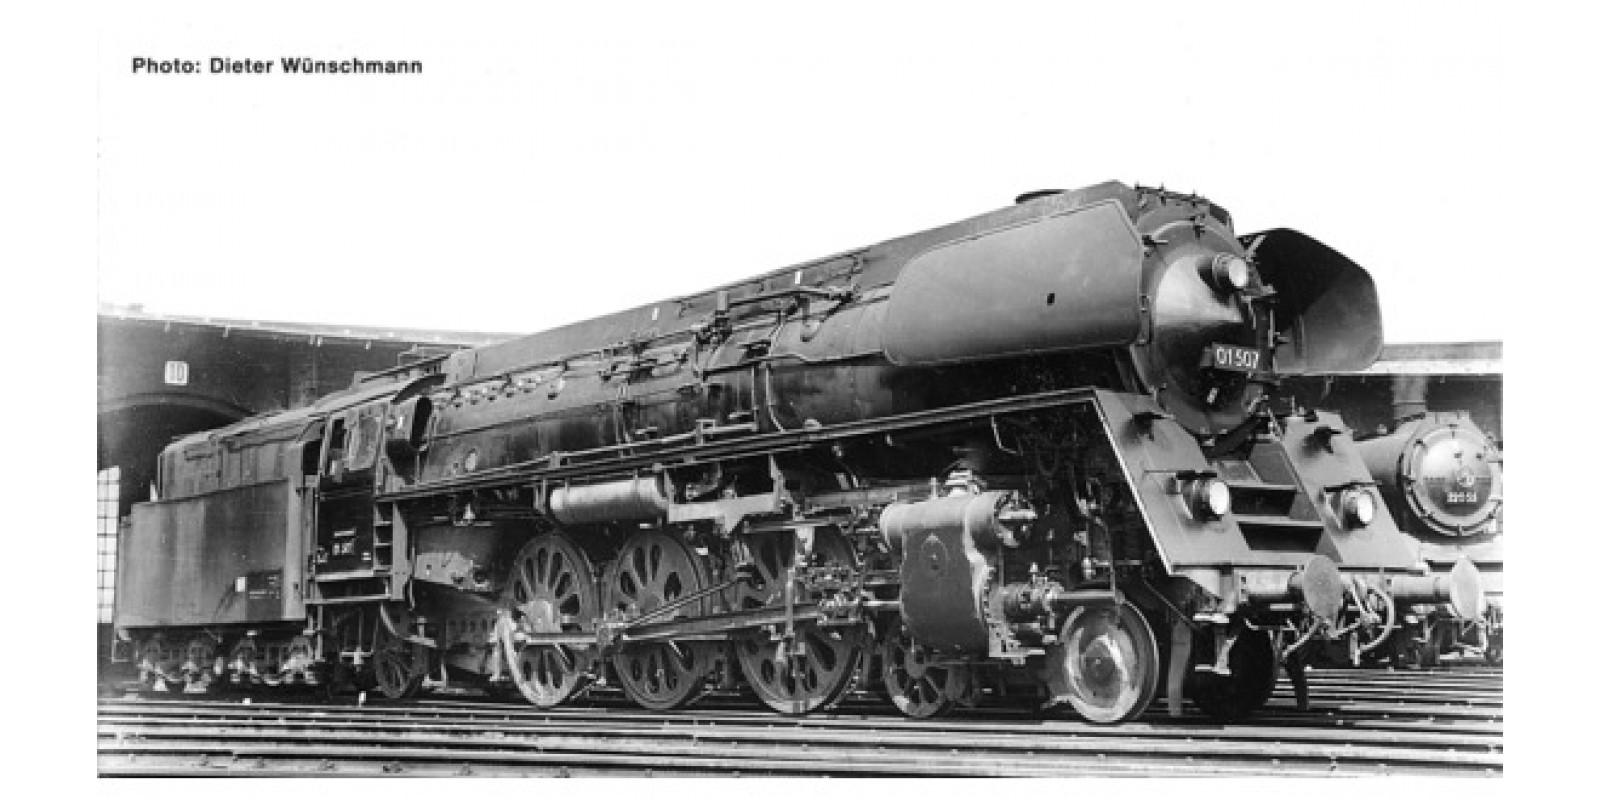 RO72135 - Steam locomotive 01 507, DR